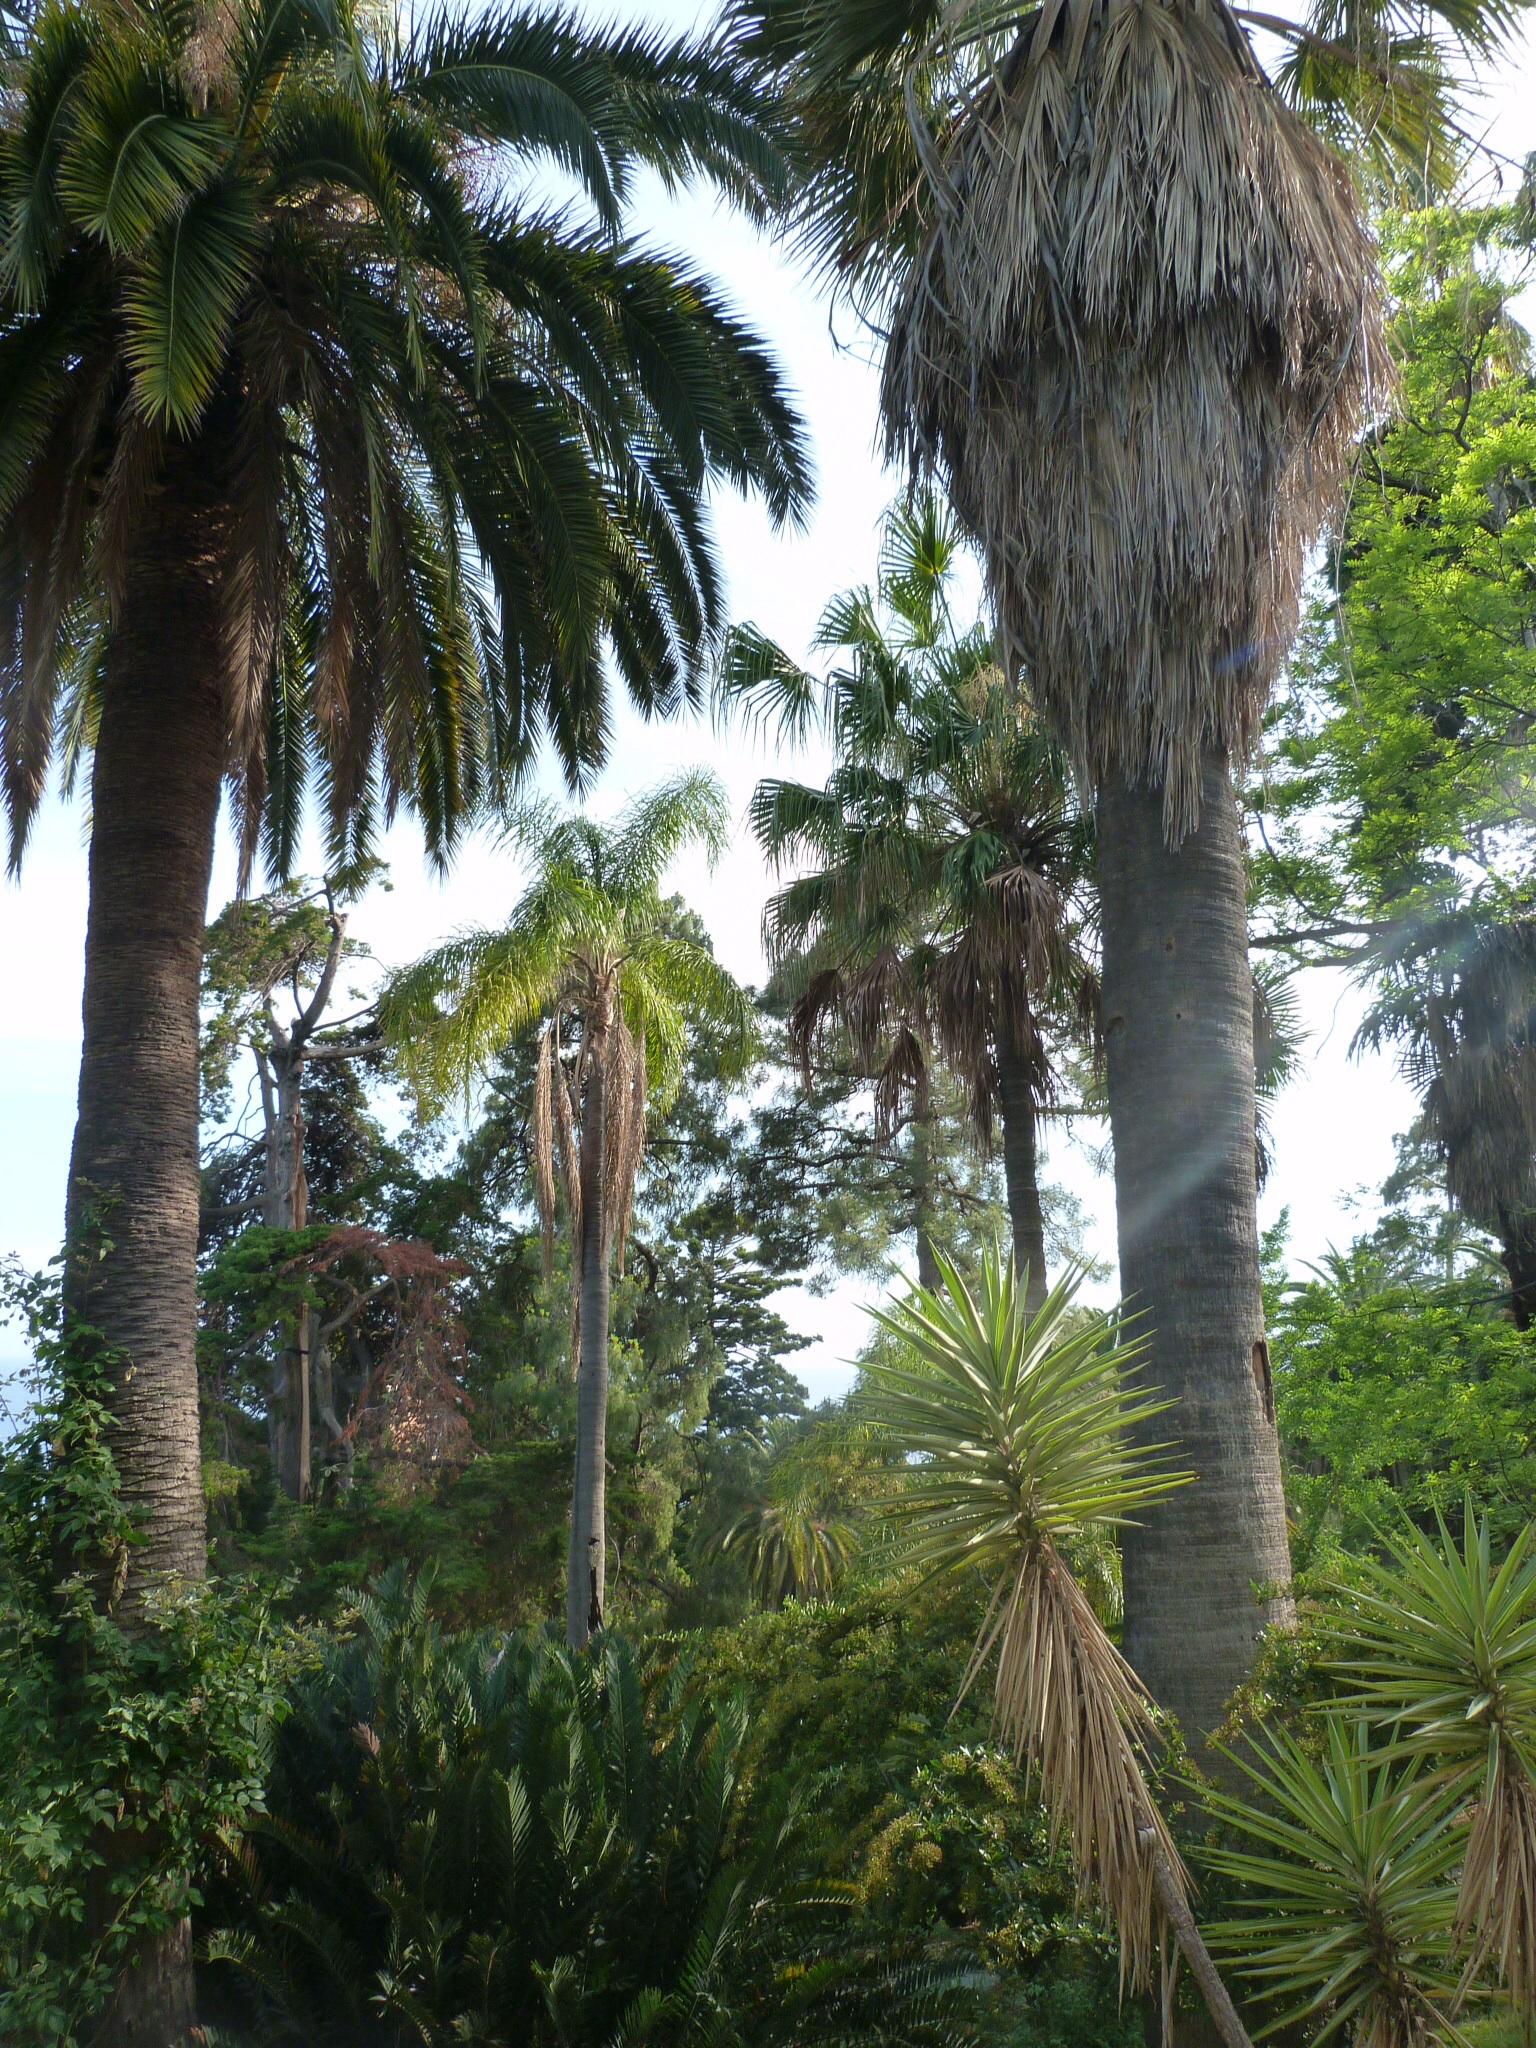 La mortola living and working at the hanbury botanical gardens le jardin champ tre for Jardin hanbury